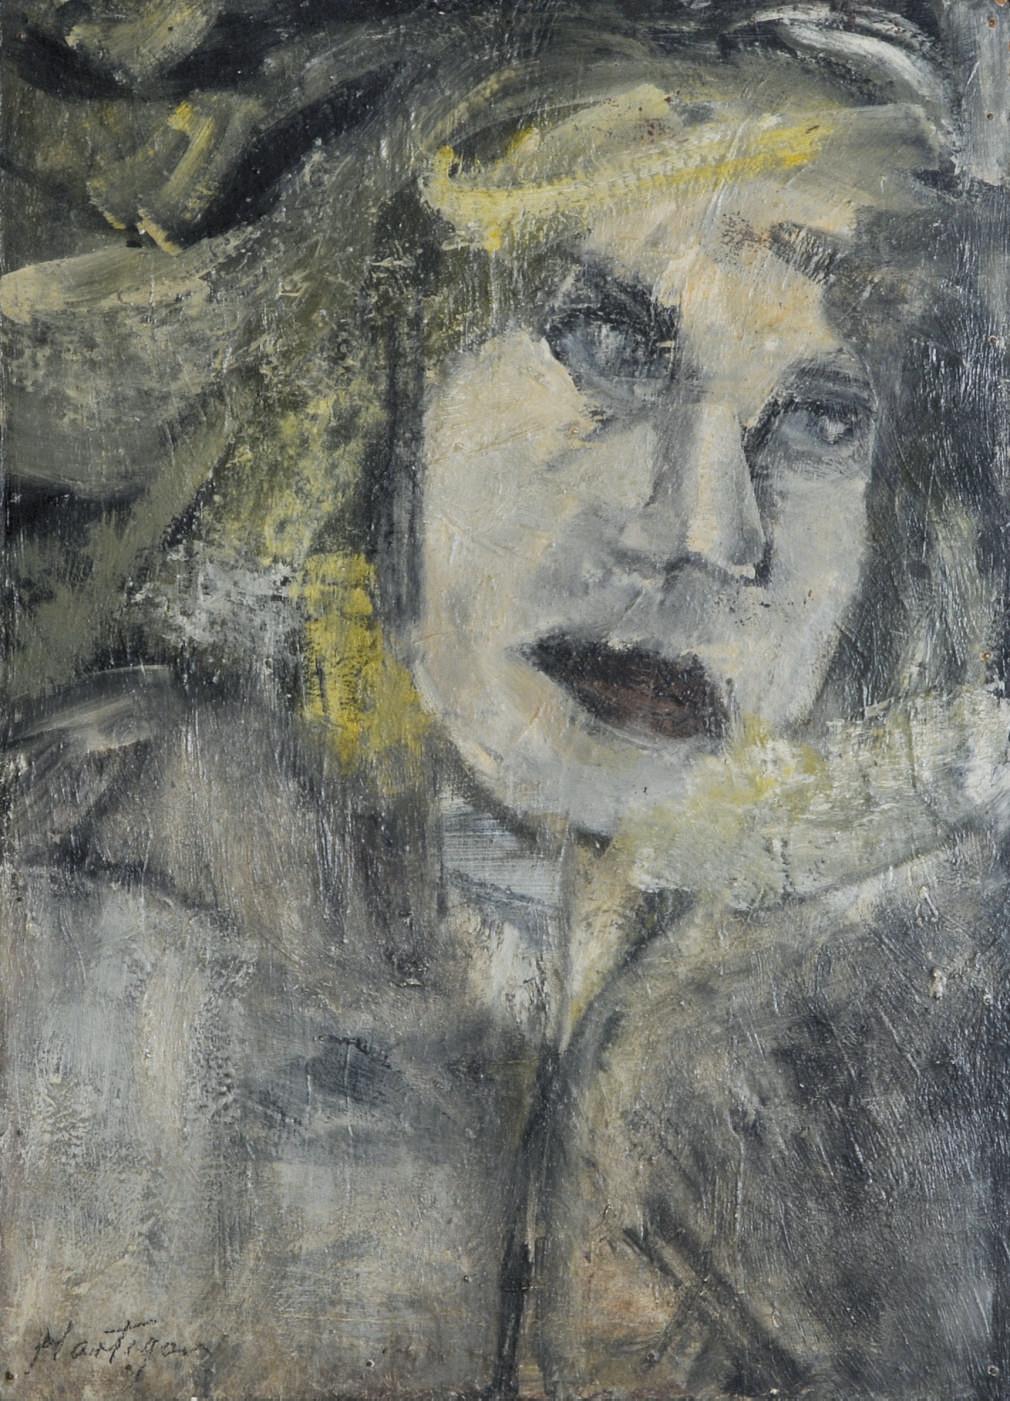 Untitled (Portrait of Lotte Lenya)